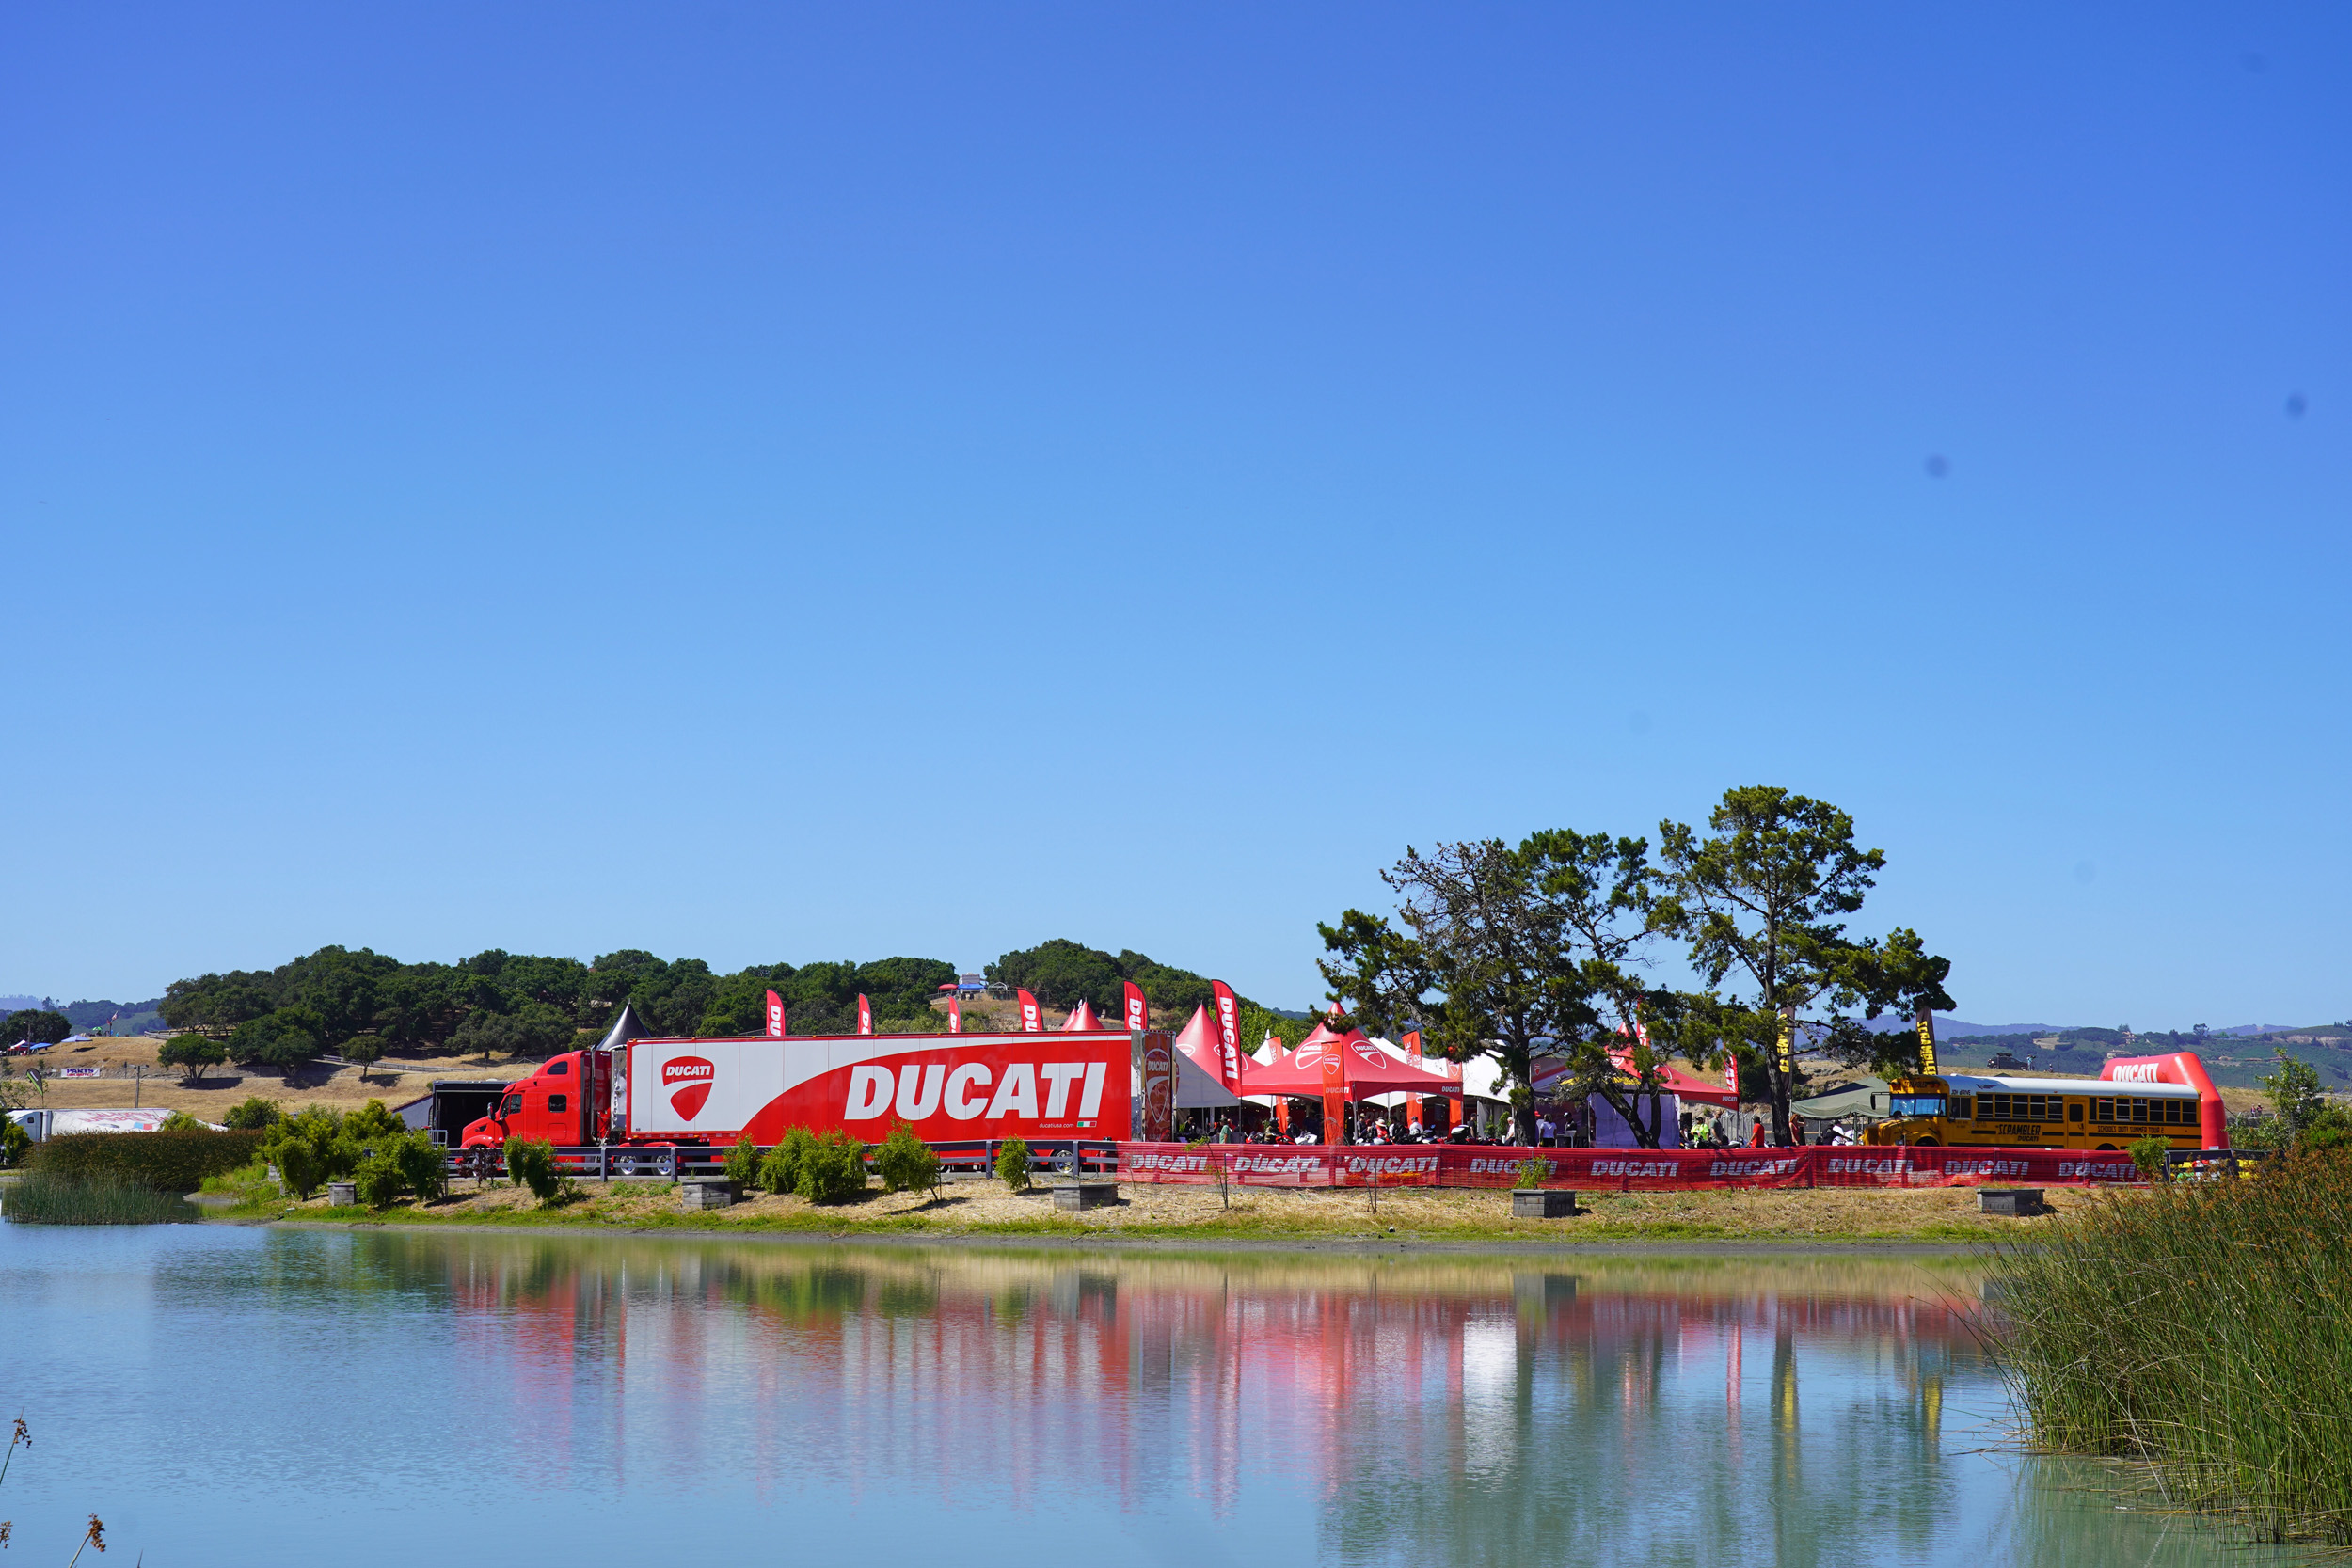 Ducati Island - WSBK Laguna Seca